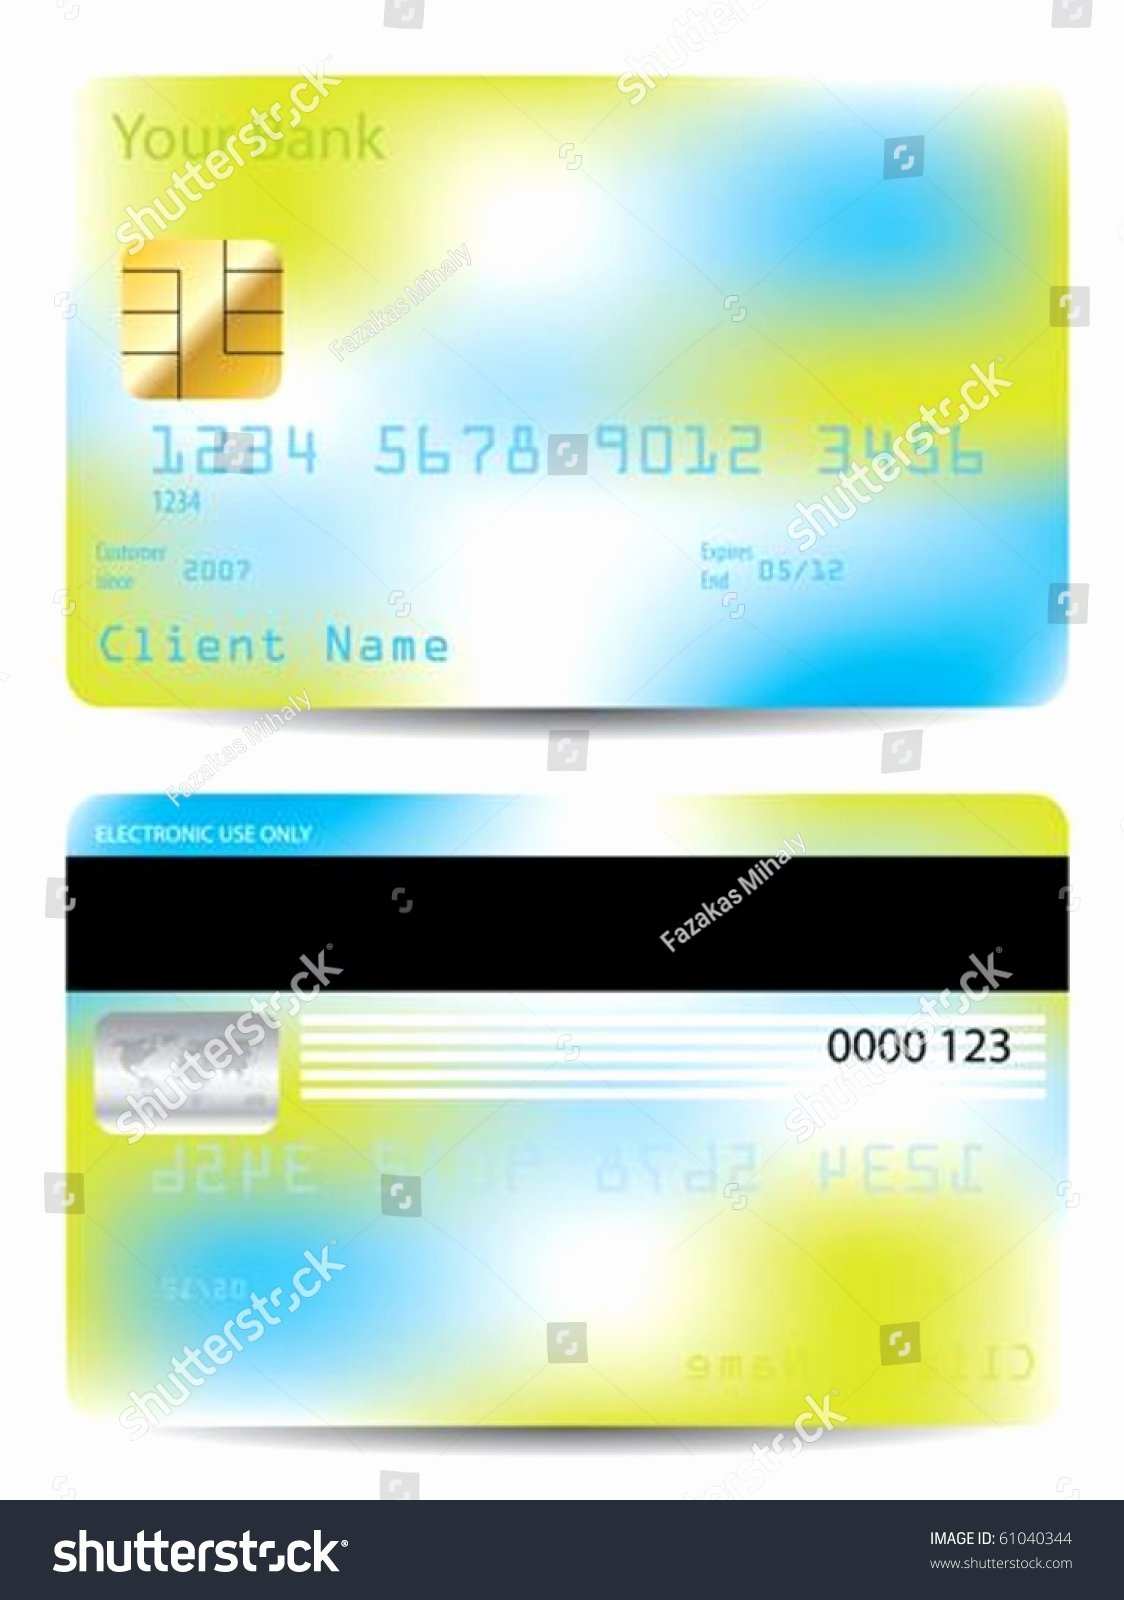 Credit Card Design Template Inspirational Colorful Credit Card Design Template Stock Vector